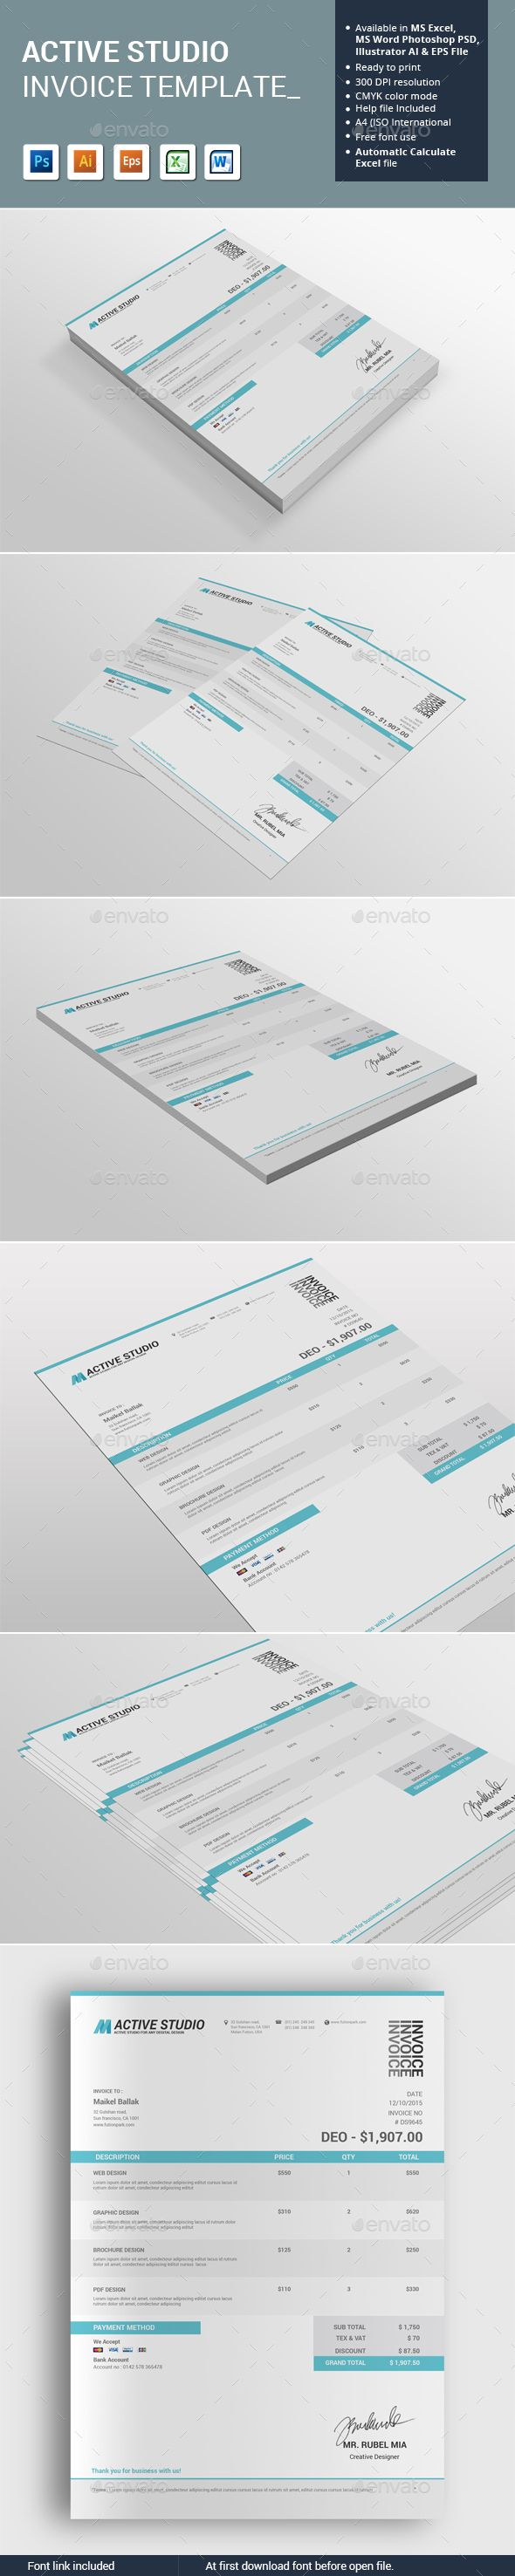 Active Studio Invoice Template | Empresas